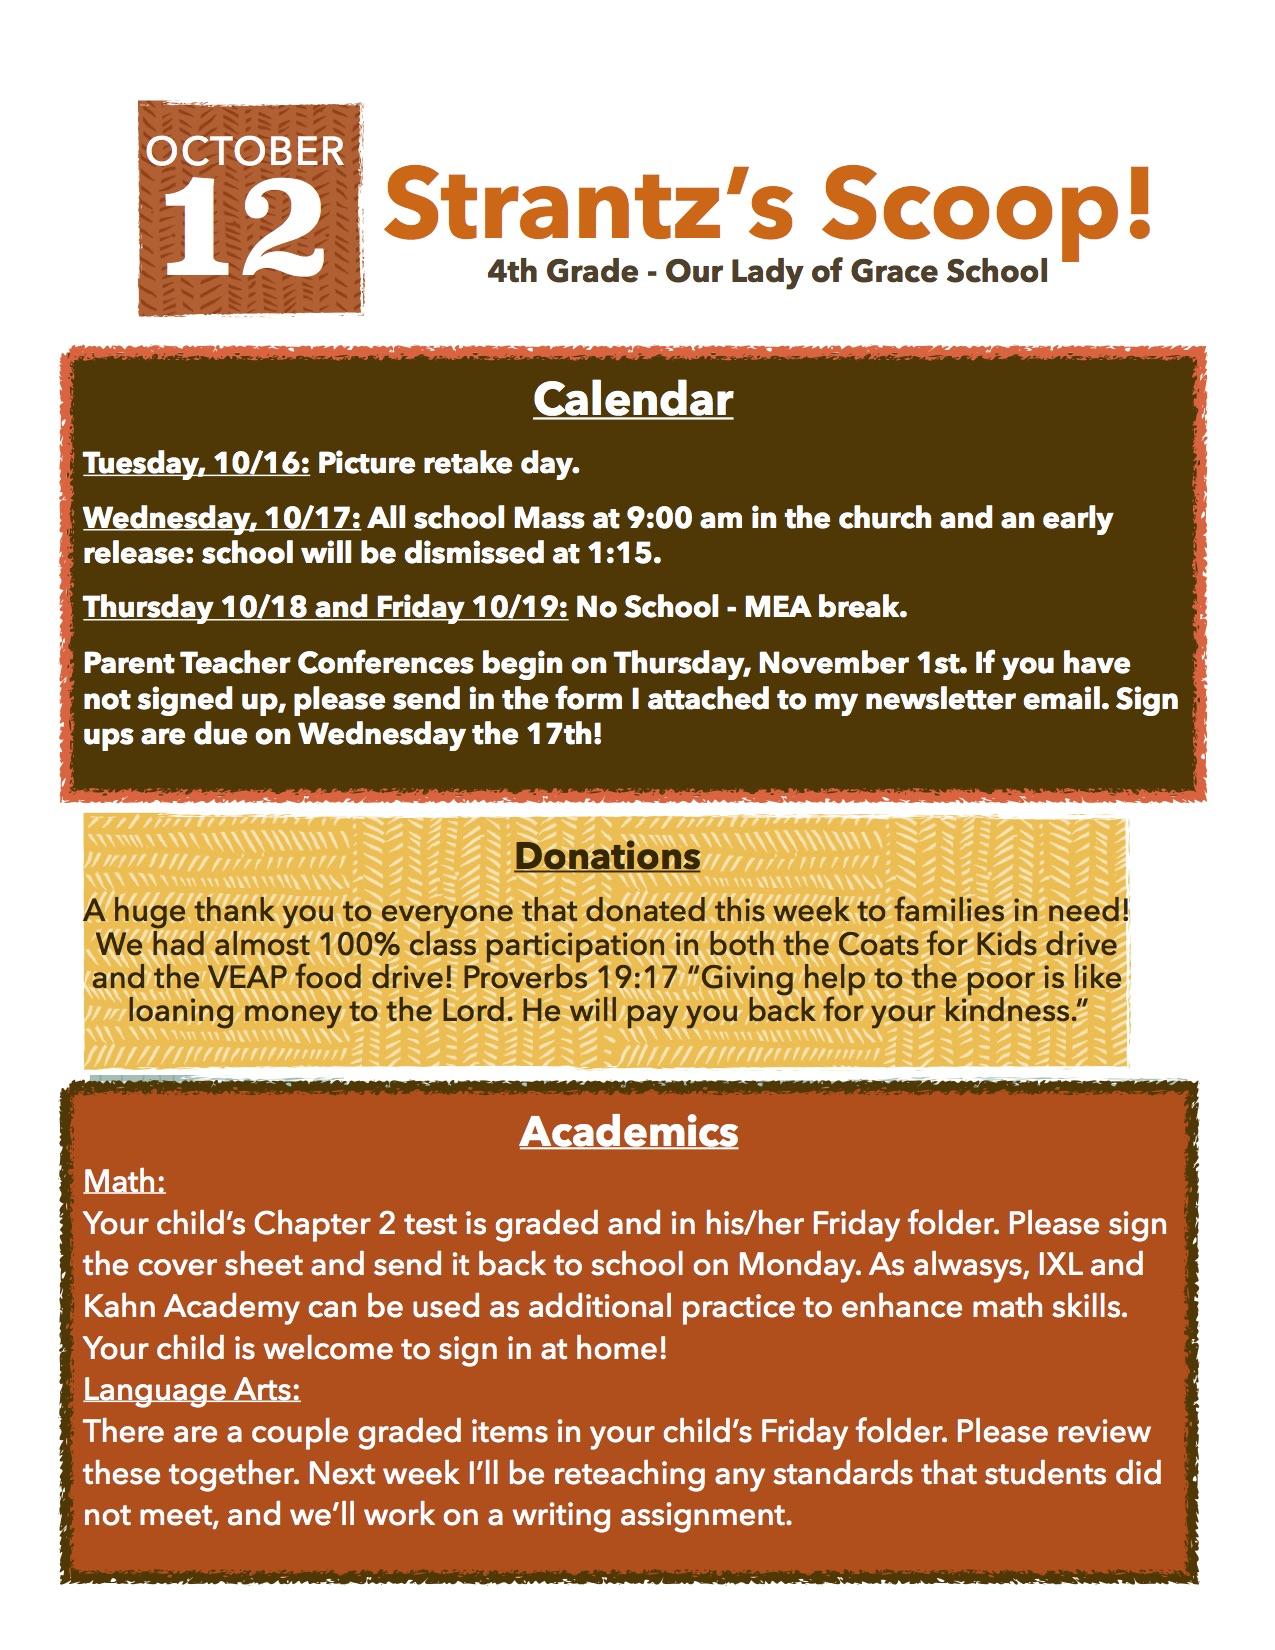 StrantzScoop10-12-18.jpg